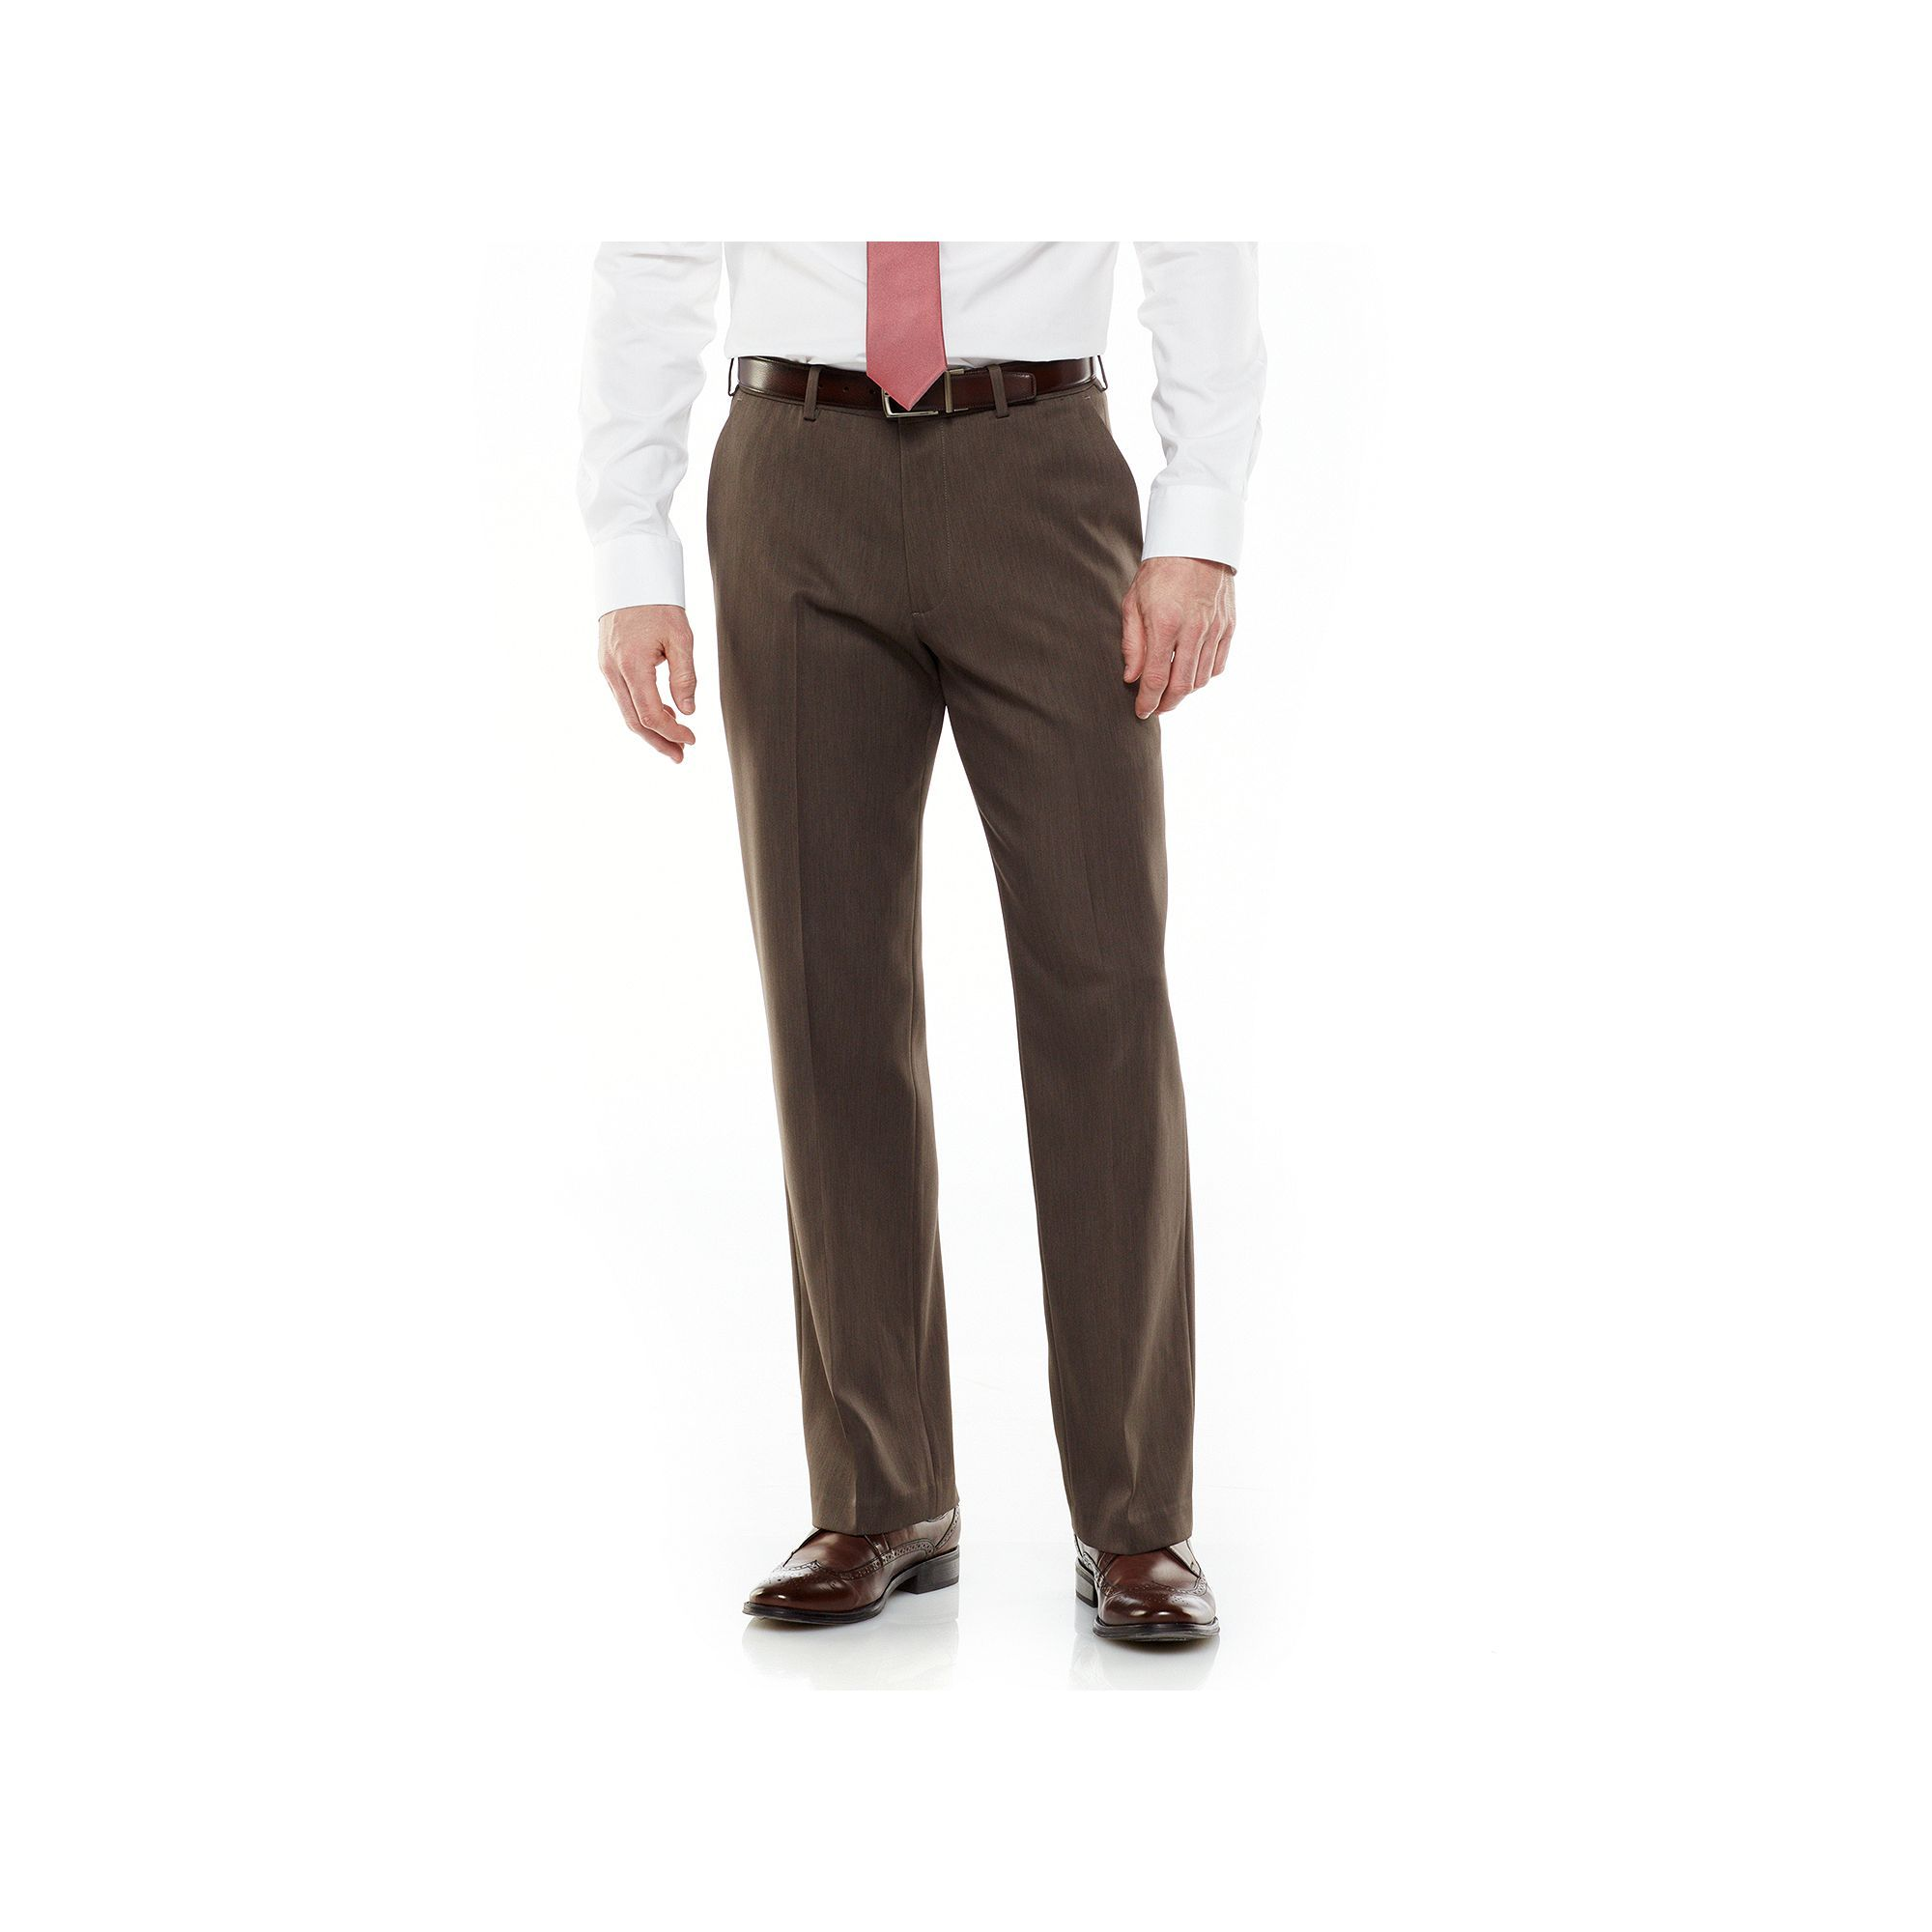 9b05215d Mens Van Heusen Traveler Flat Front Dress Pants